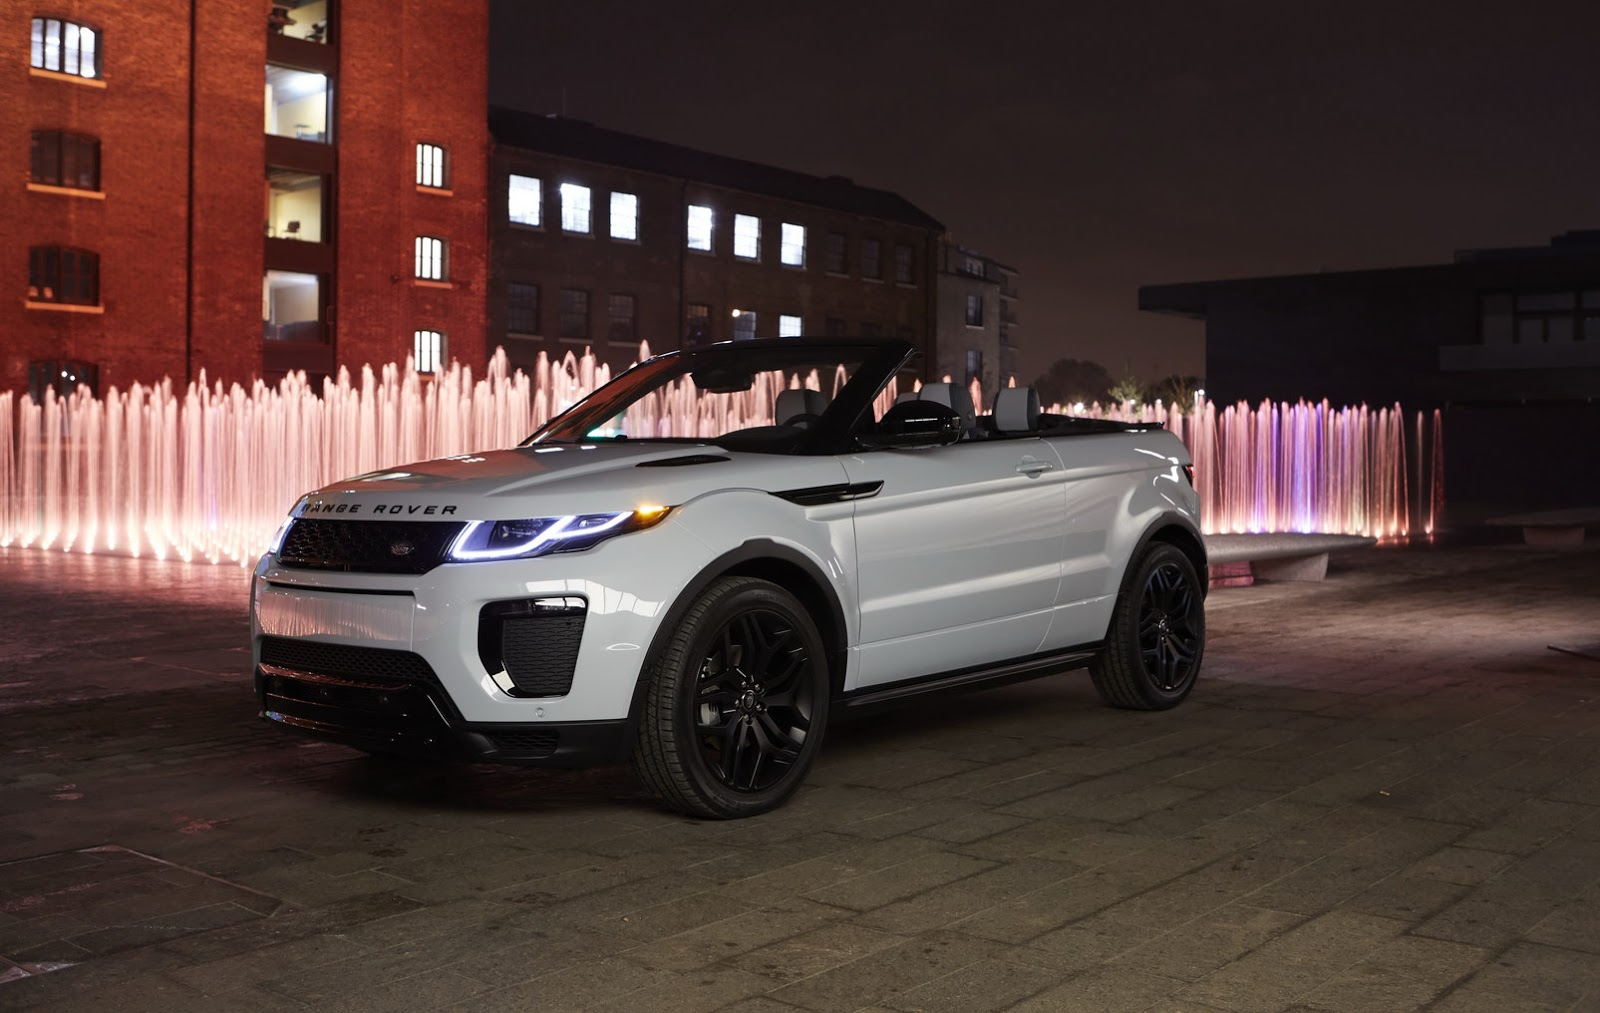 New-Range-Rover-Evoque-Convertible 2017 ரேஞ்ச்ரோவர் எவோக் கன்வெர்டிபிள் அறிமுகம் - LA AUTO SHOW 2015